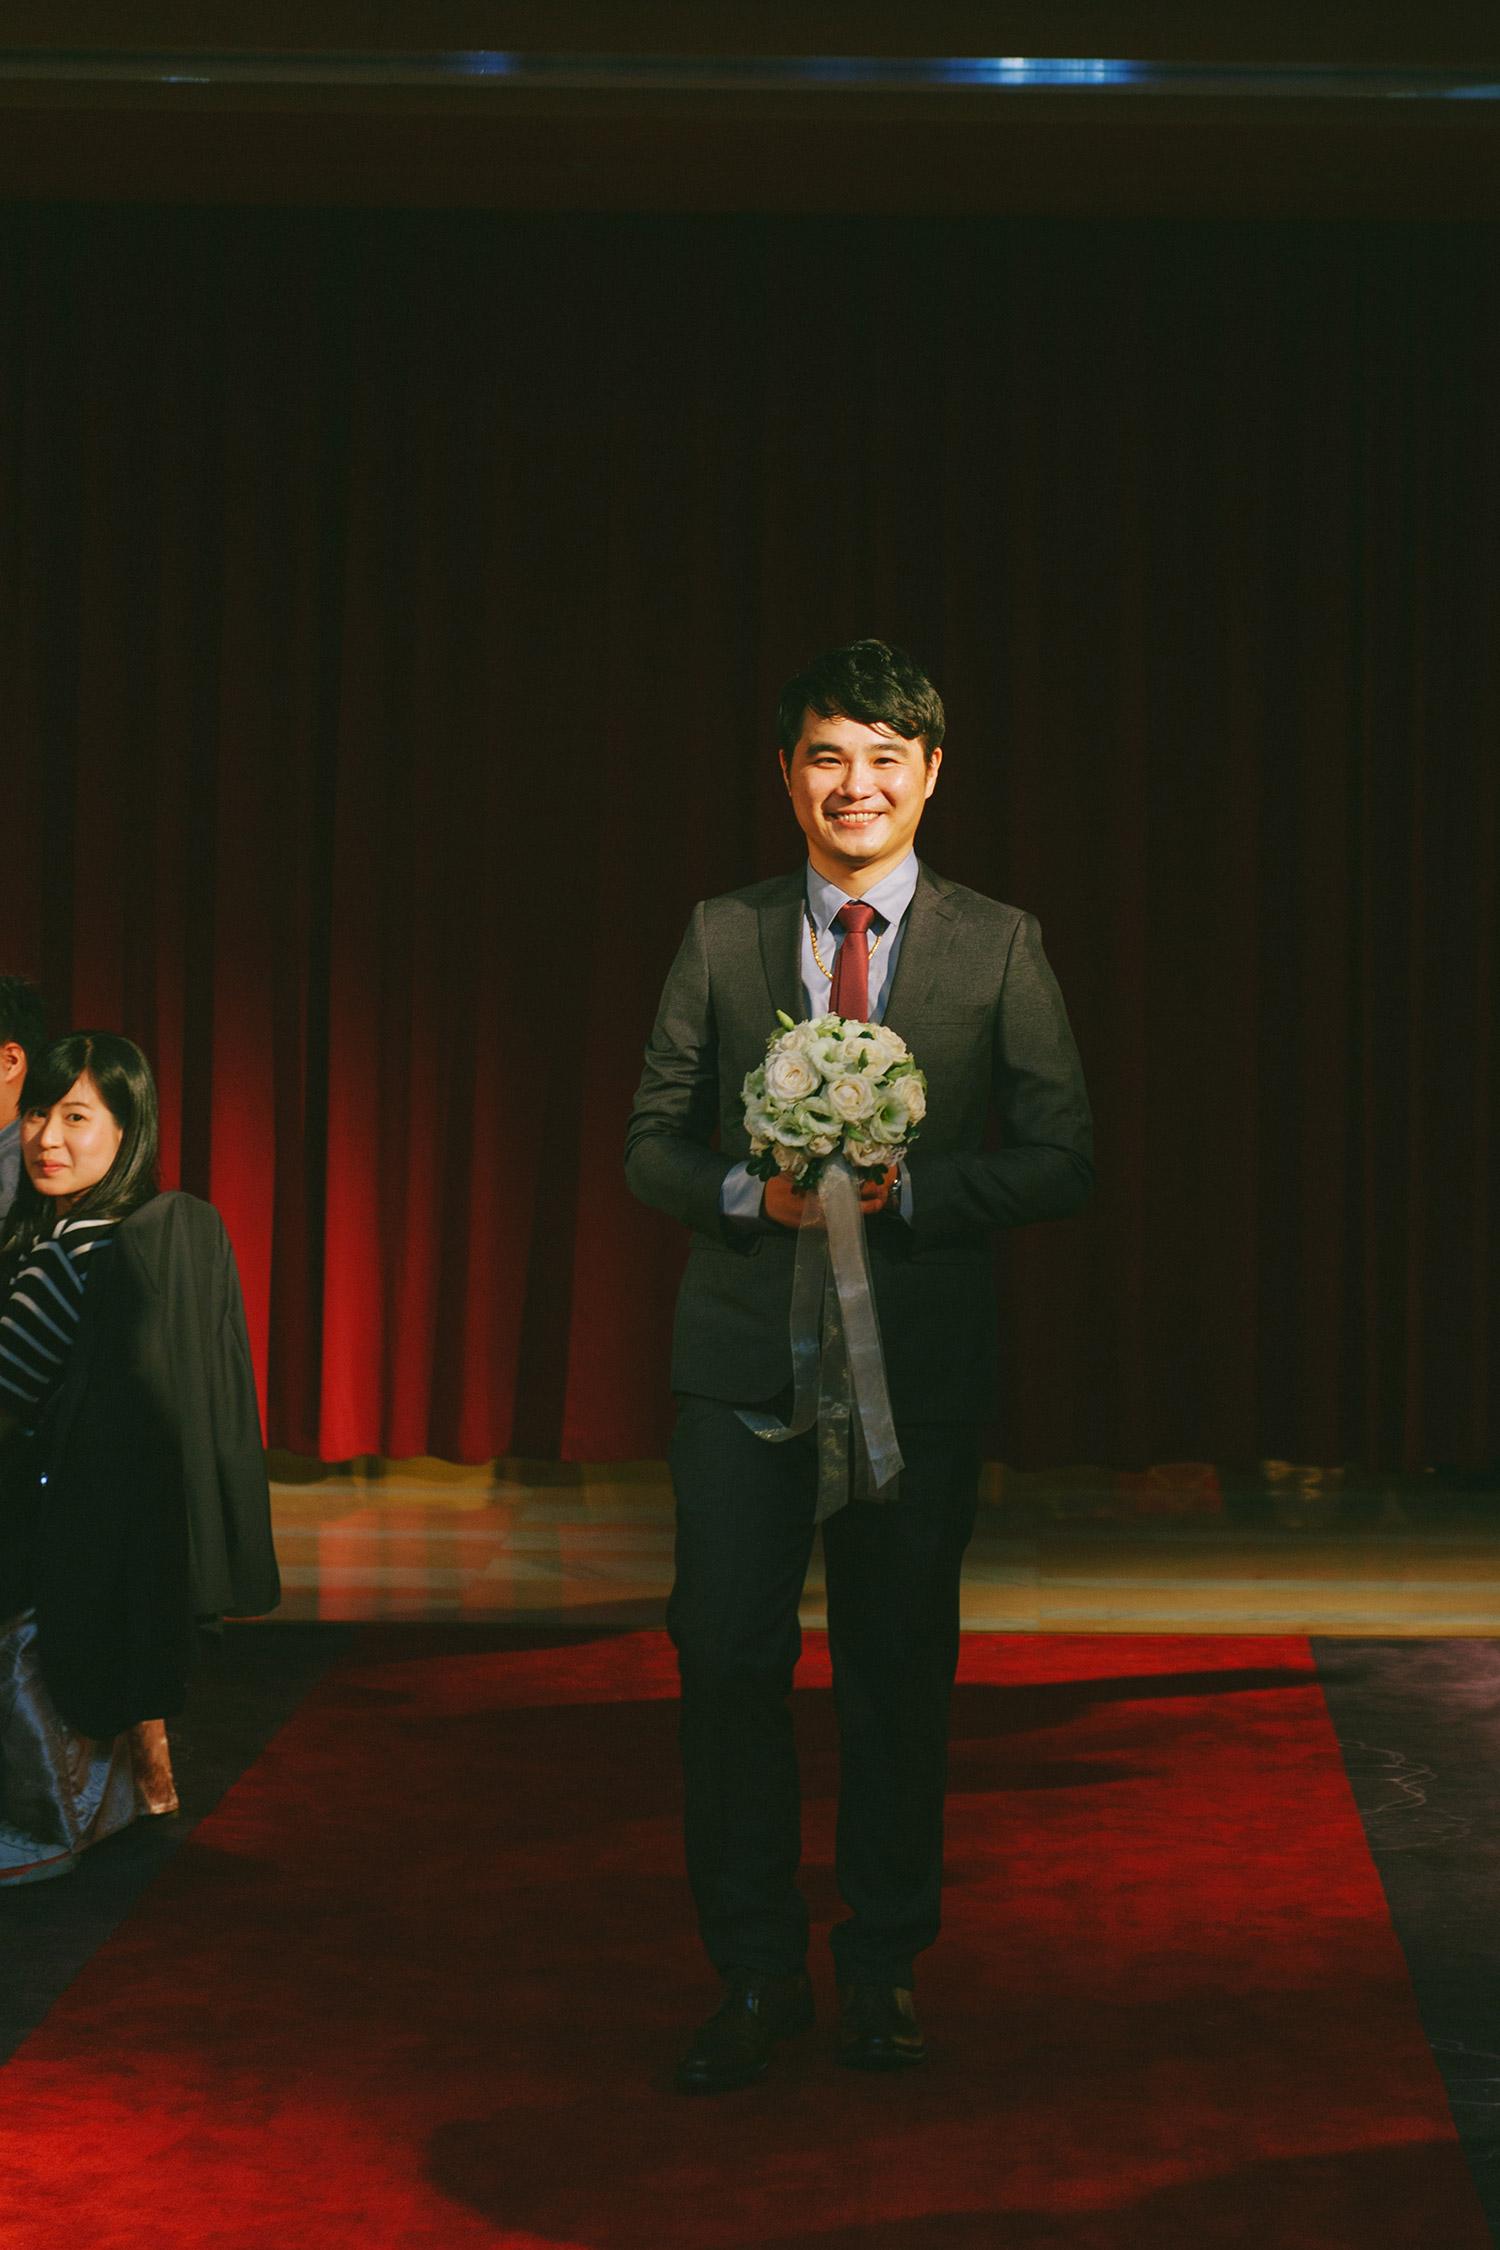 wedding_portfolio_076_118